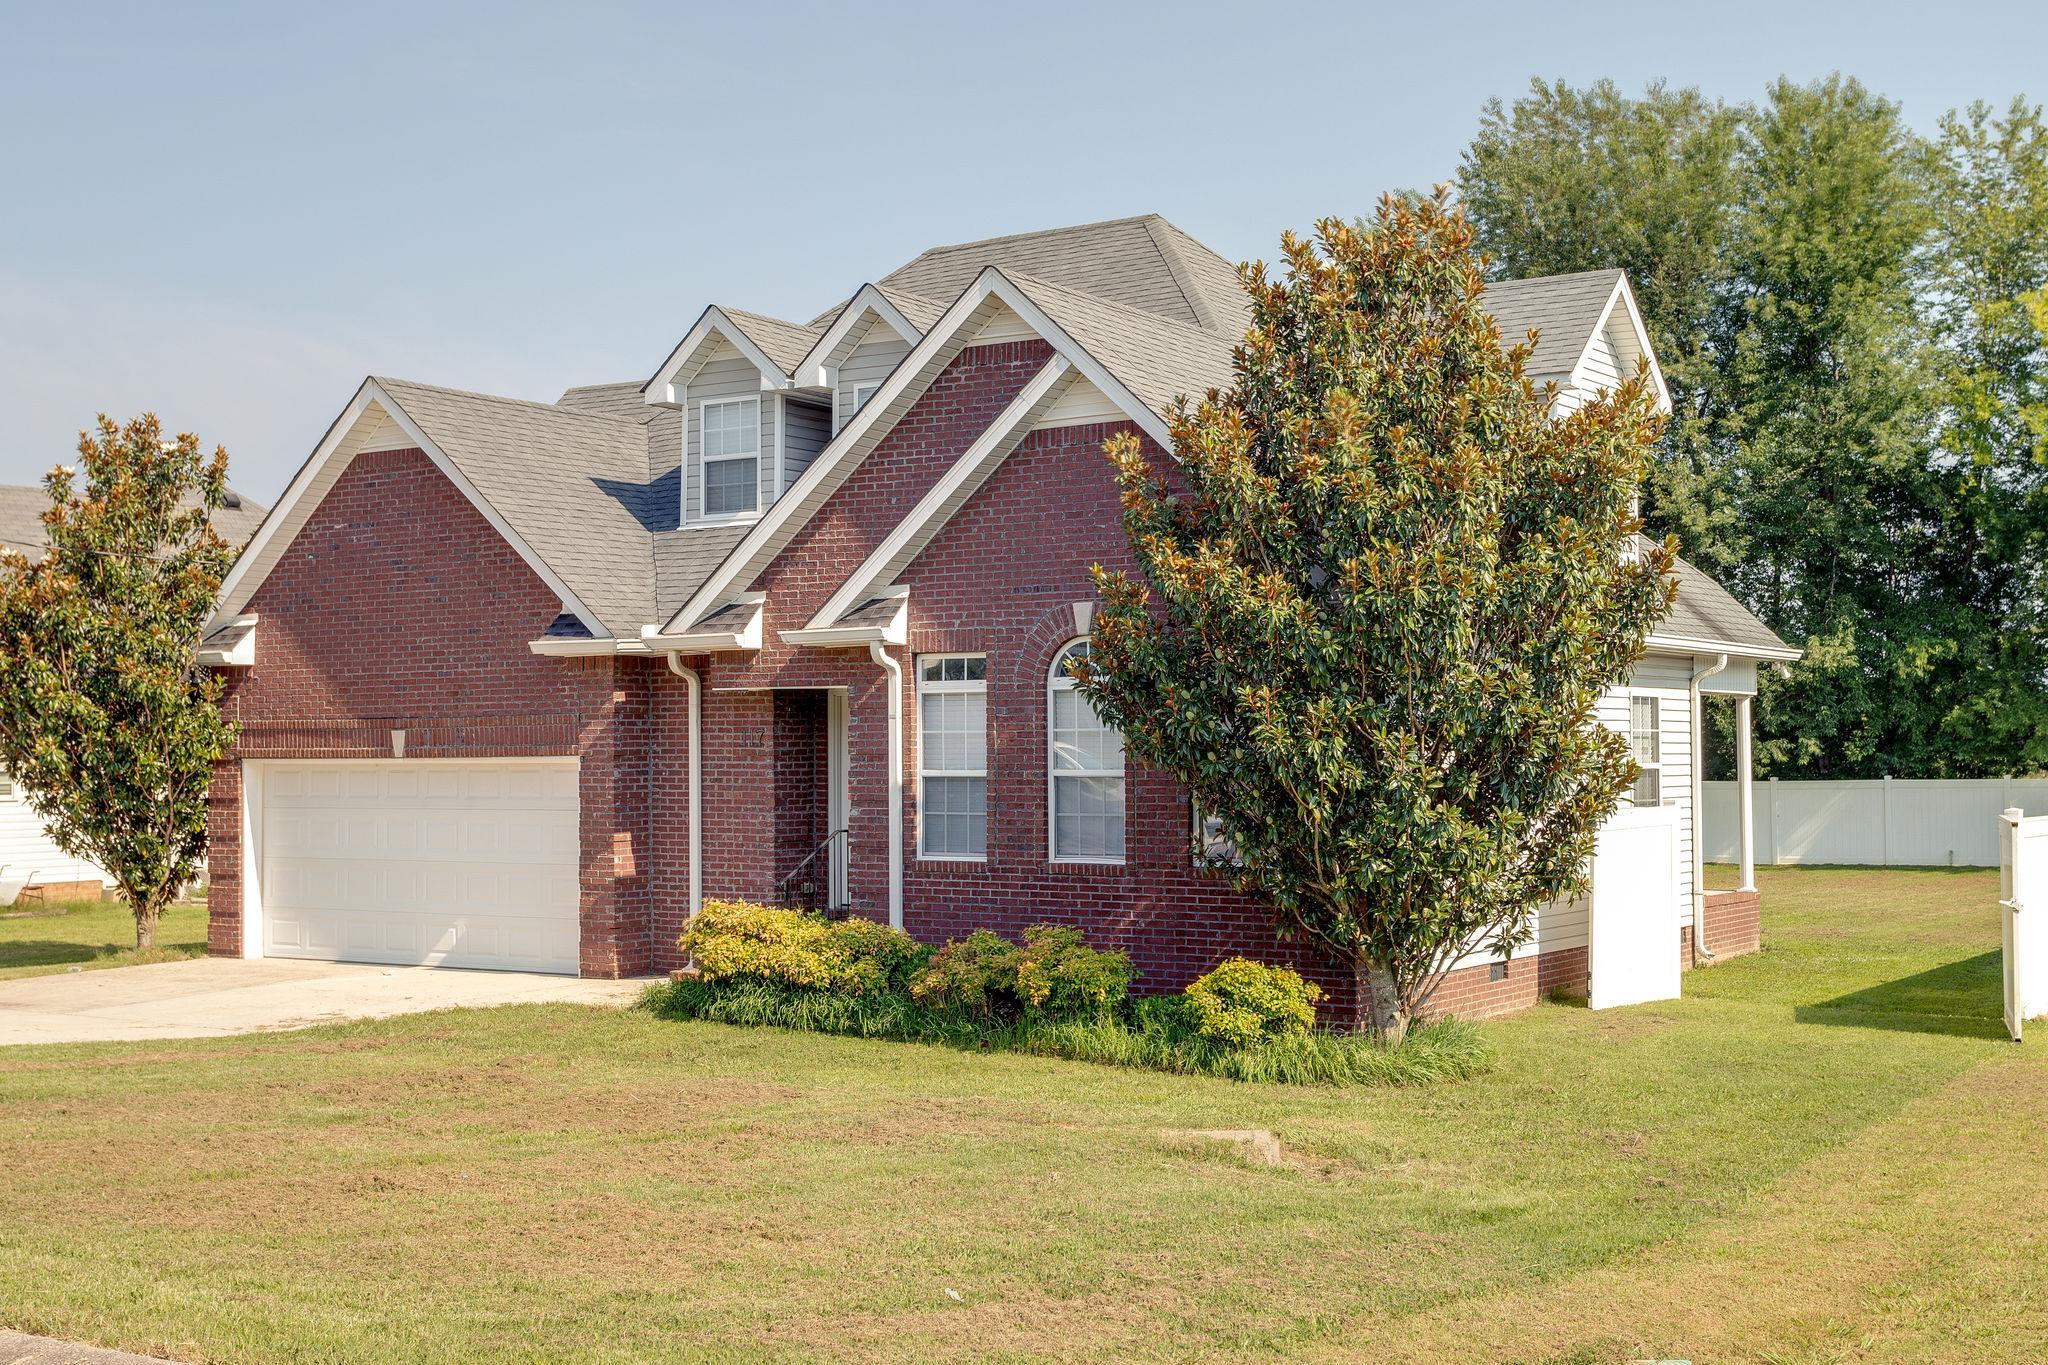 117 Raven Ct, Shelbyville, TN 37160 - Shelbyville, TN real estate listing